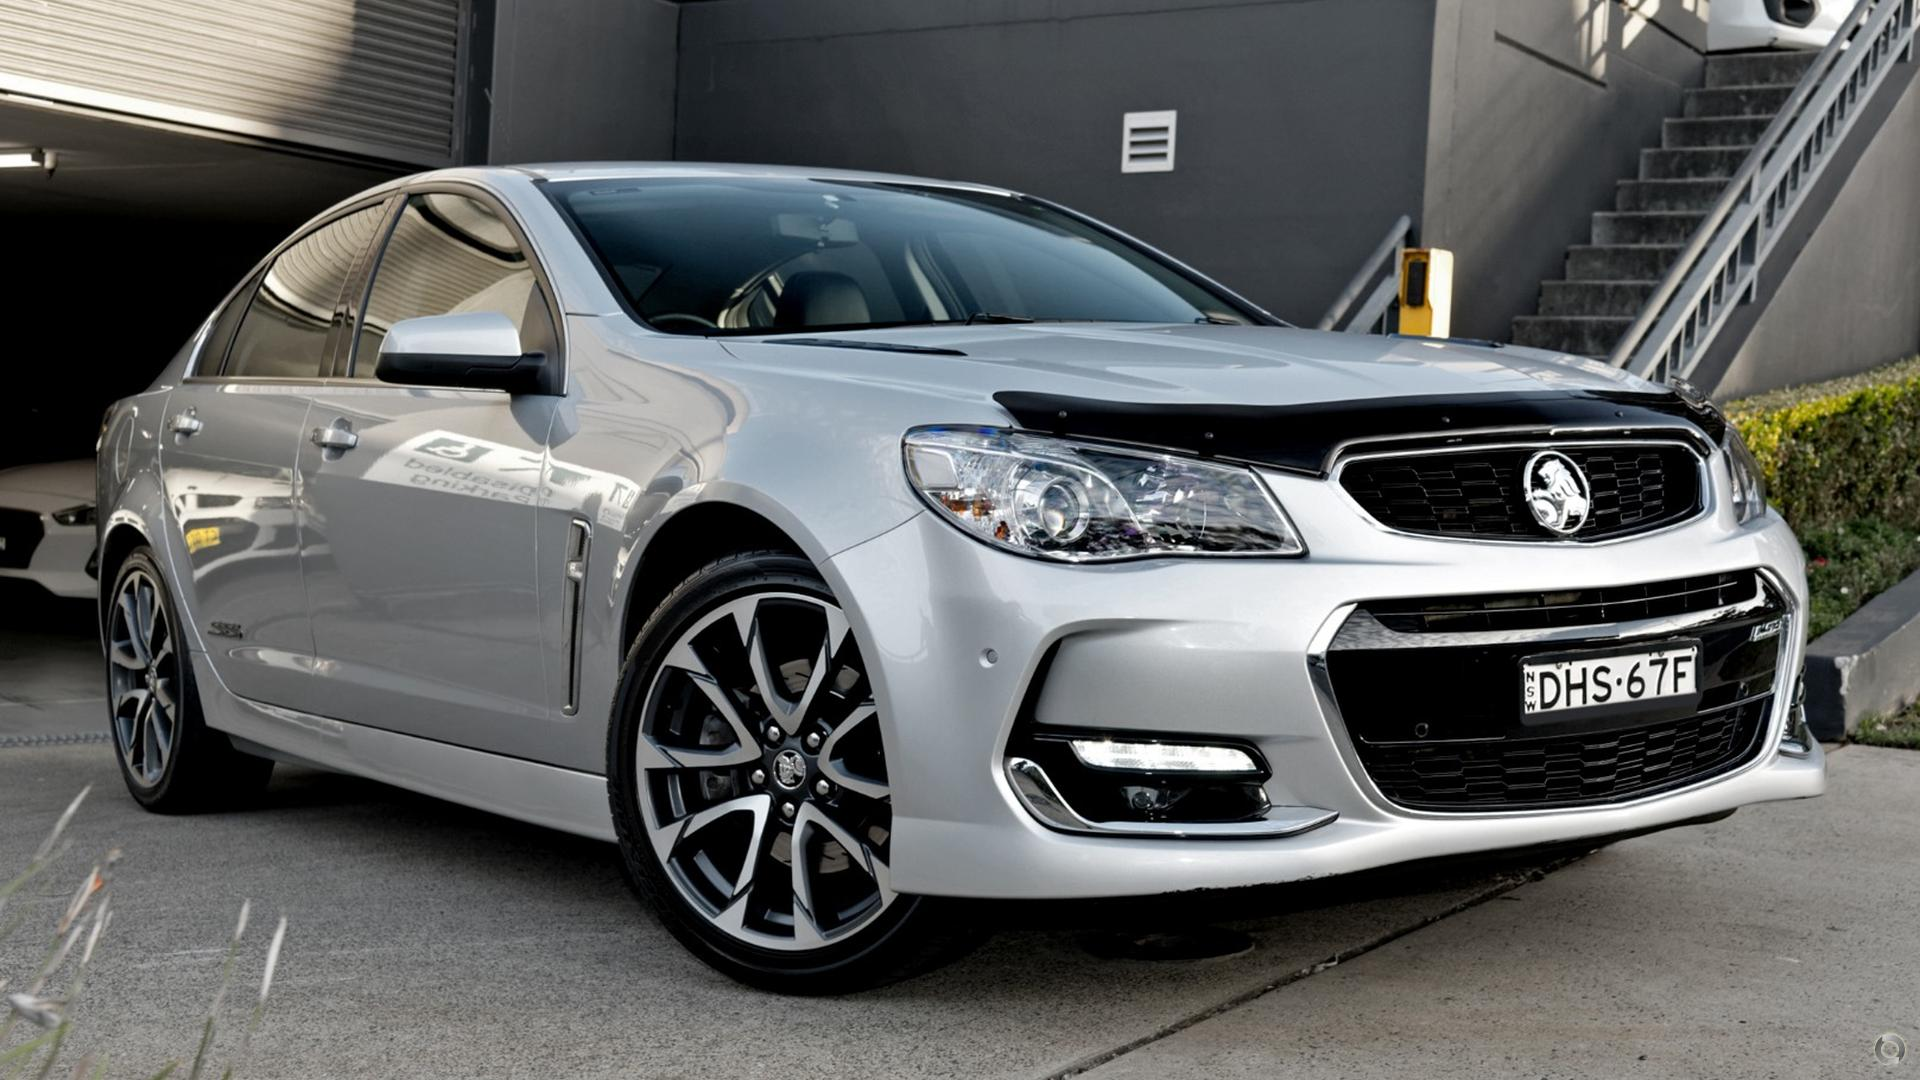 2016 Holden Commodore VF Series II